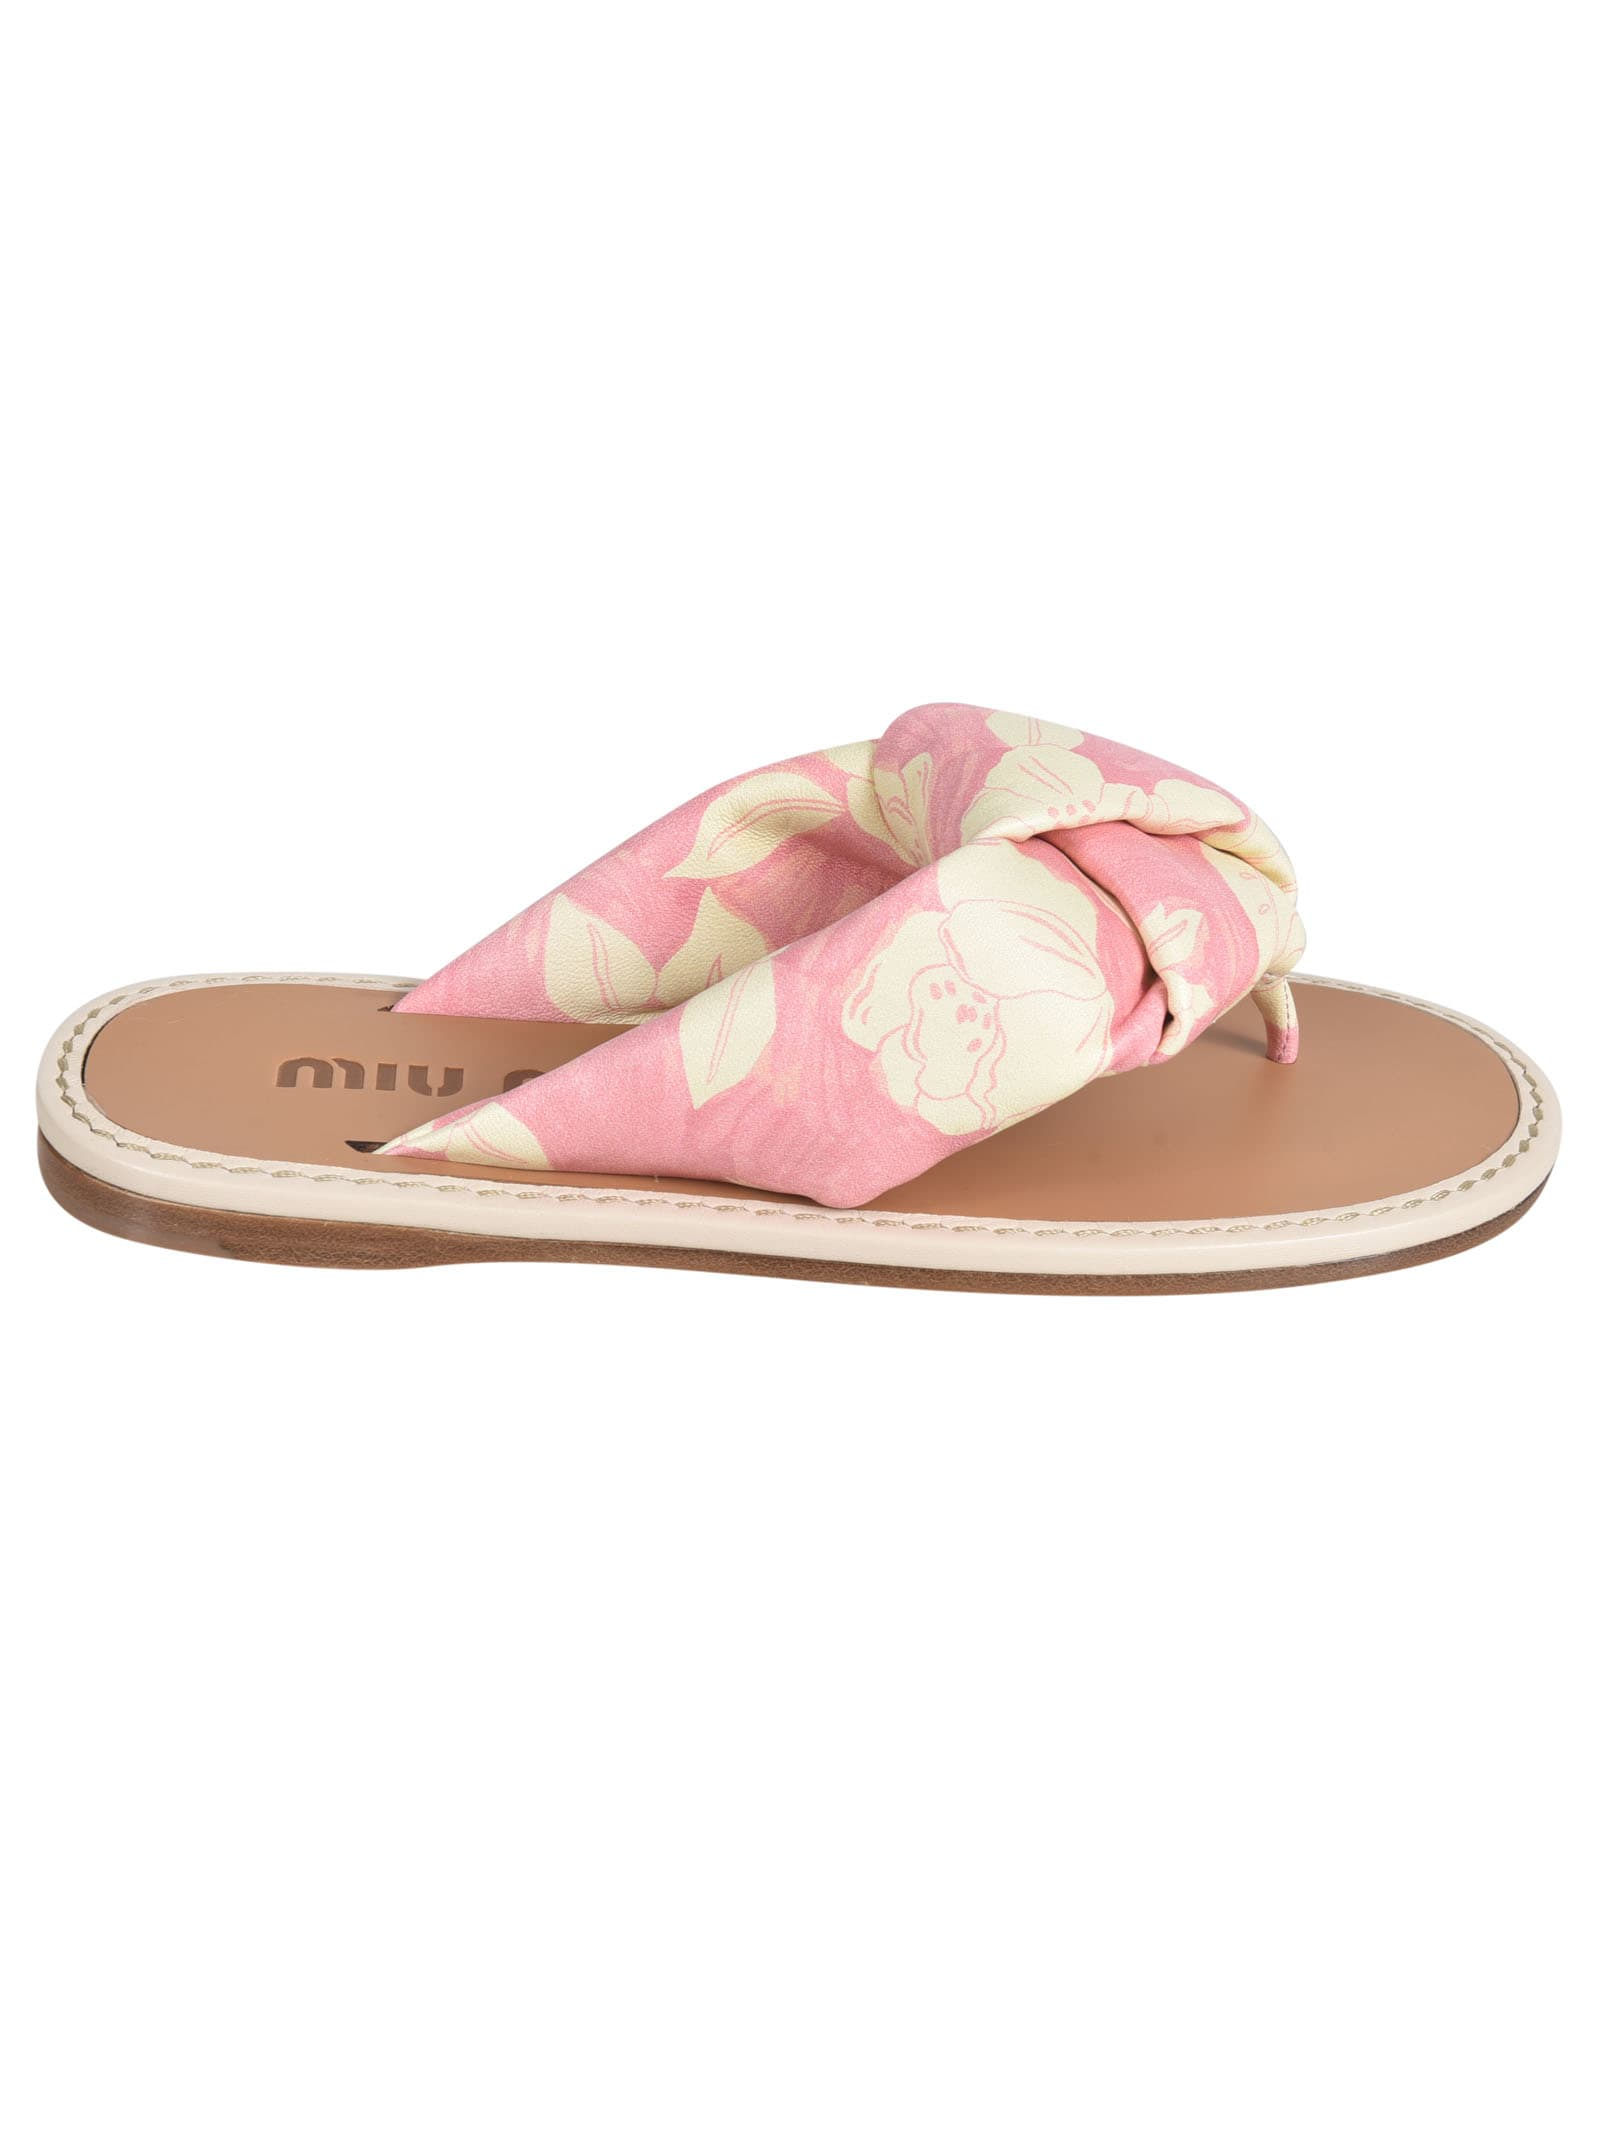 Buy Miu Miu Floral Printed Flip Flops online, shop Miu Miu shoes with free shipping